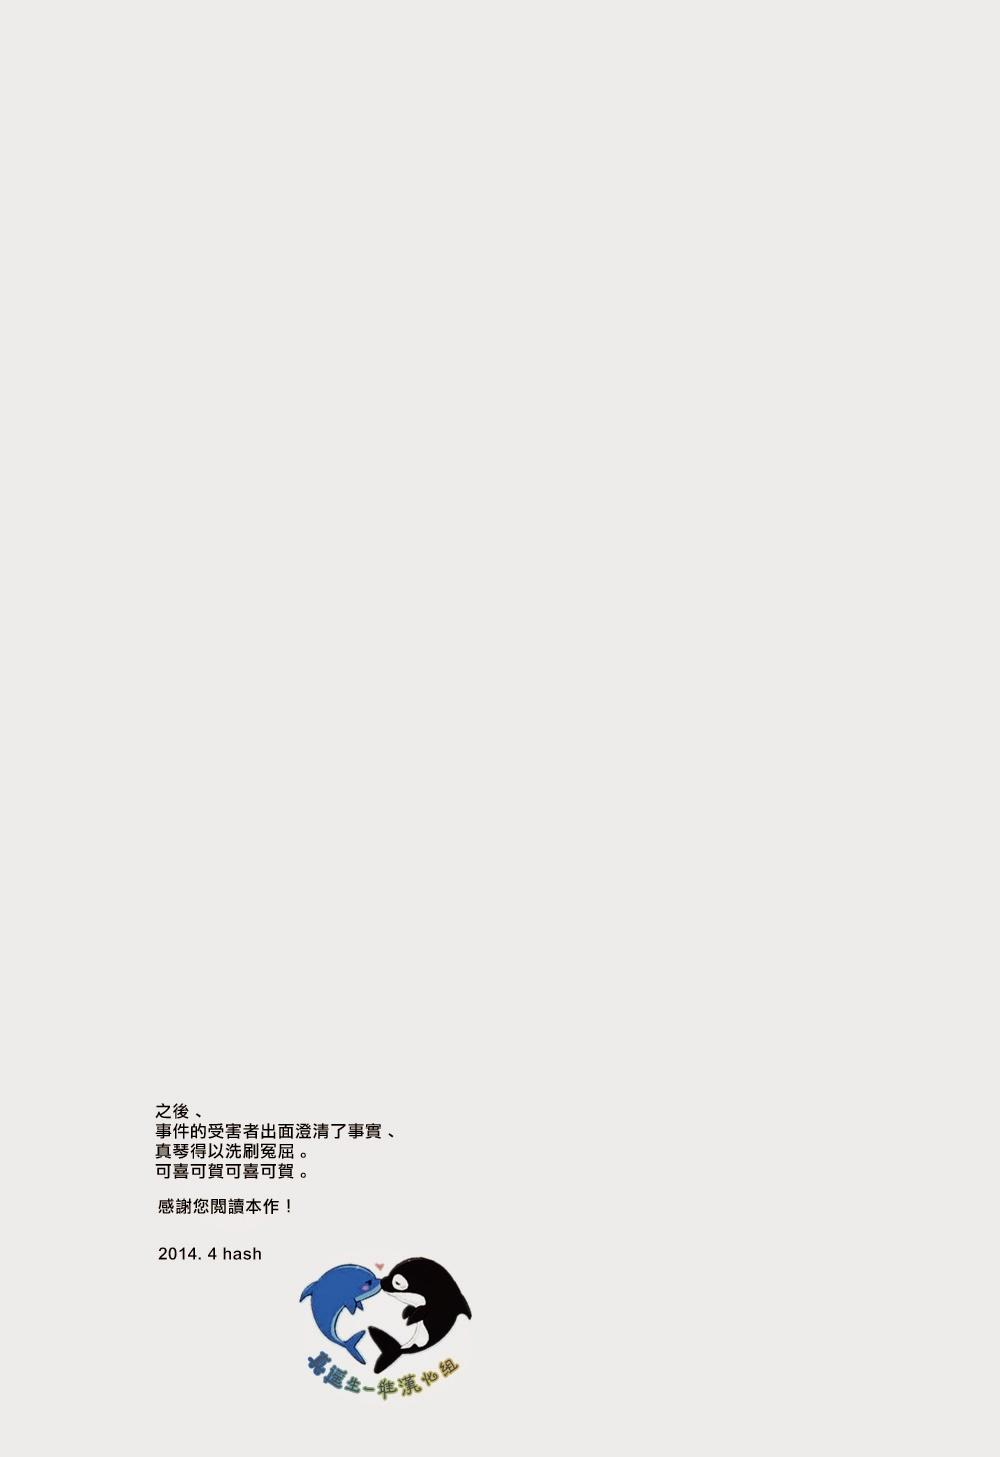 Sekaijuu, Doko demo. | 全世界、無論何處。 30